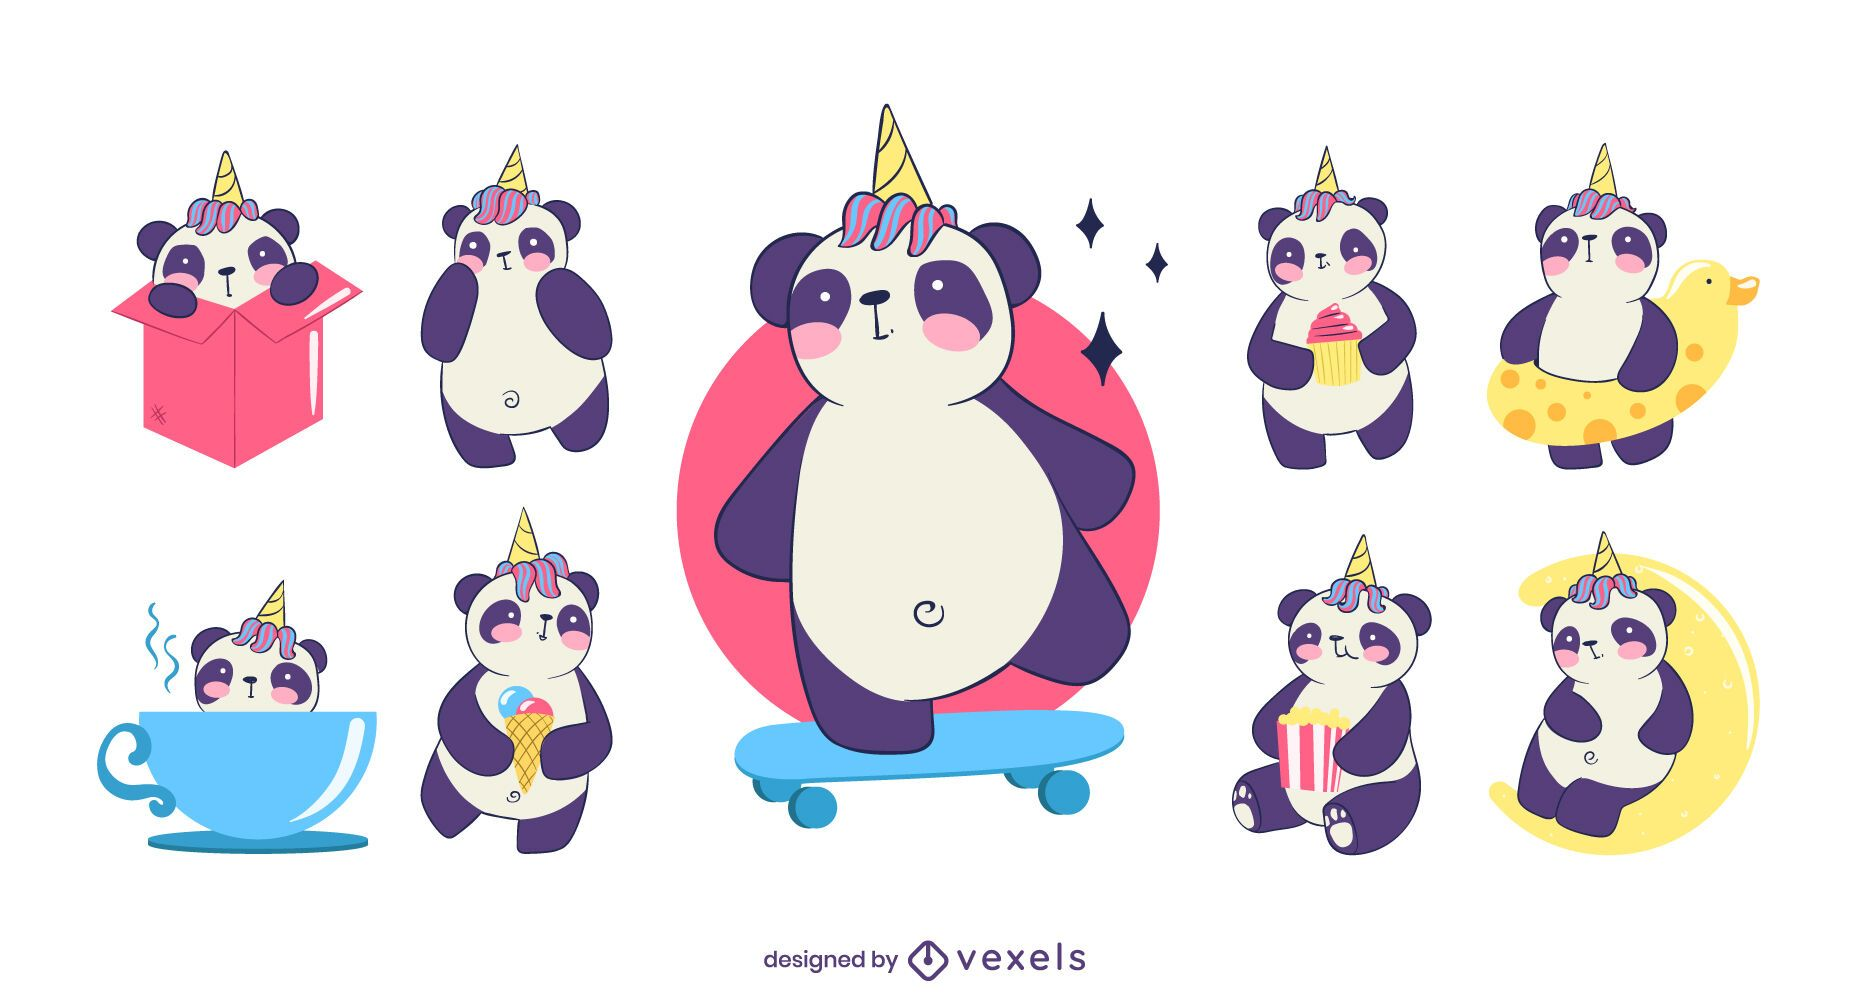 Cute panda unicorn character set